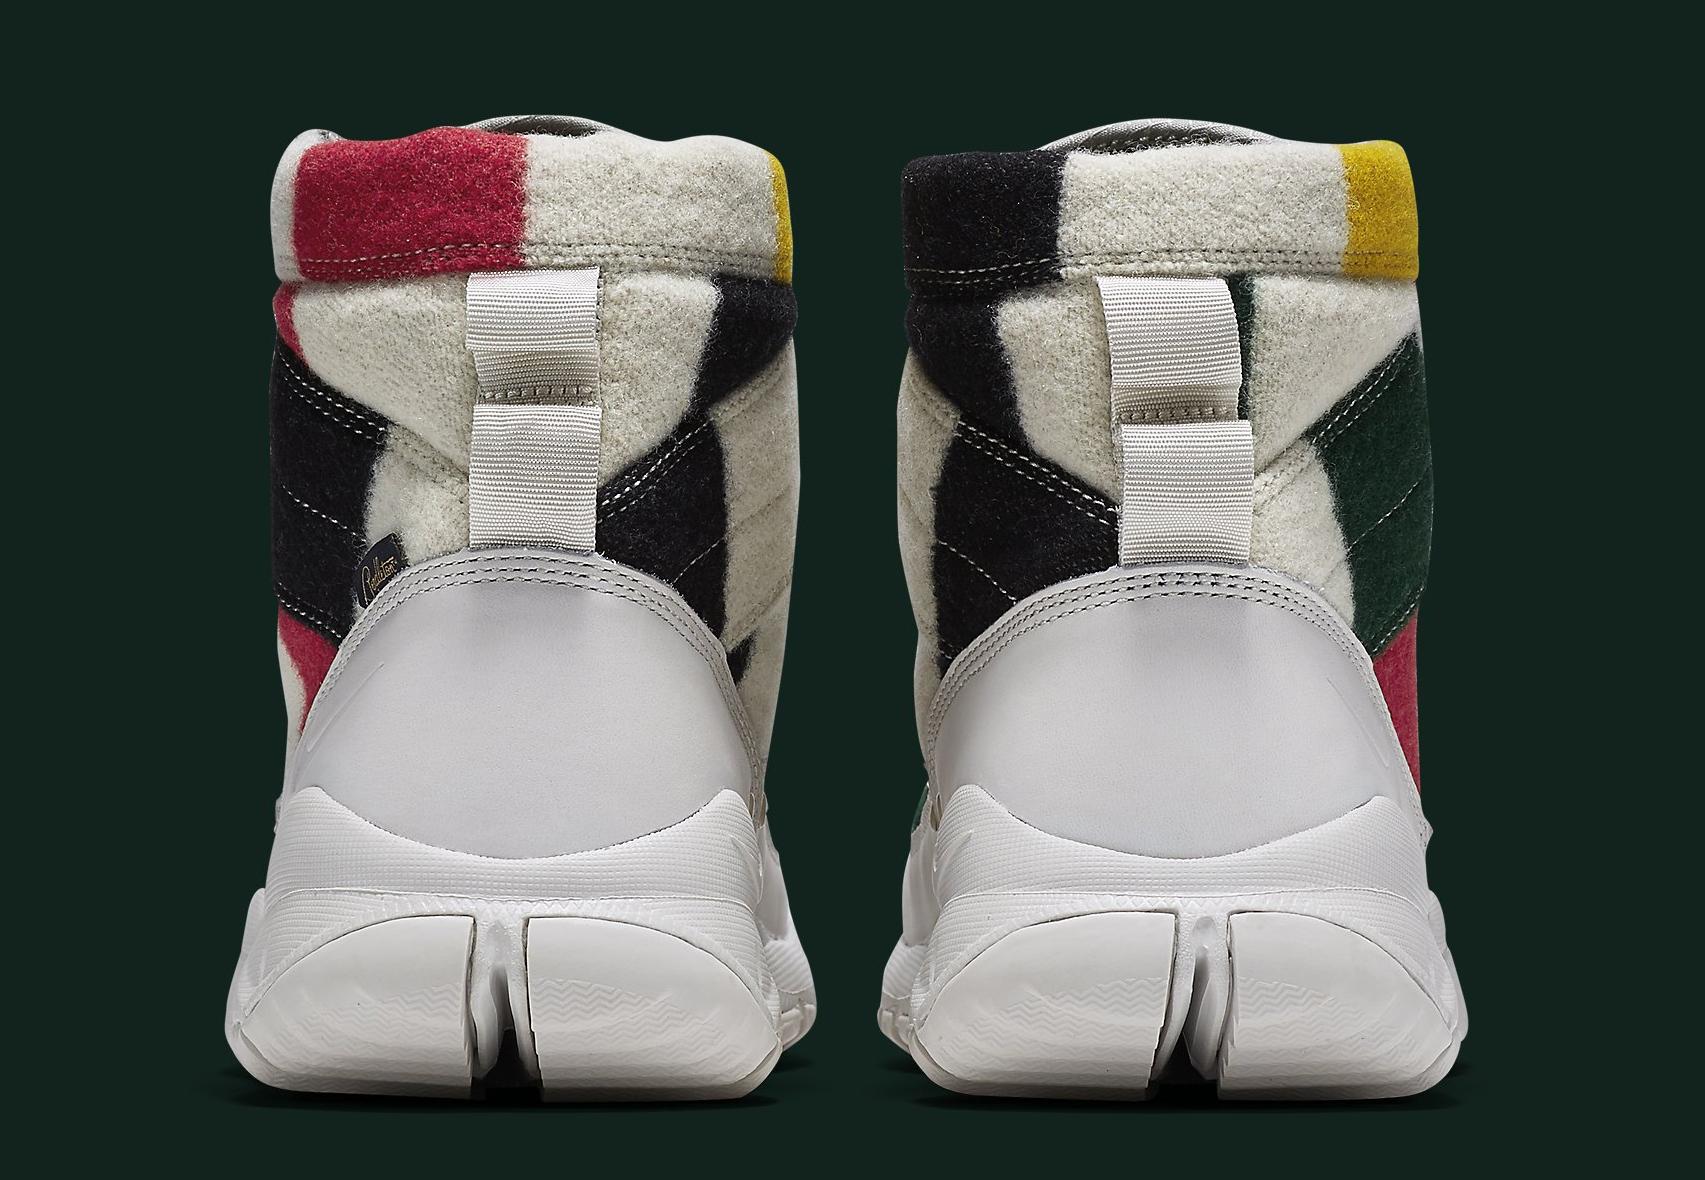 Pendleton Nike SFB 6 Inch Boot 875040-101 Heel